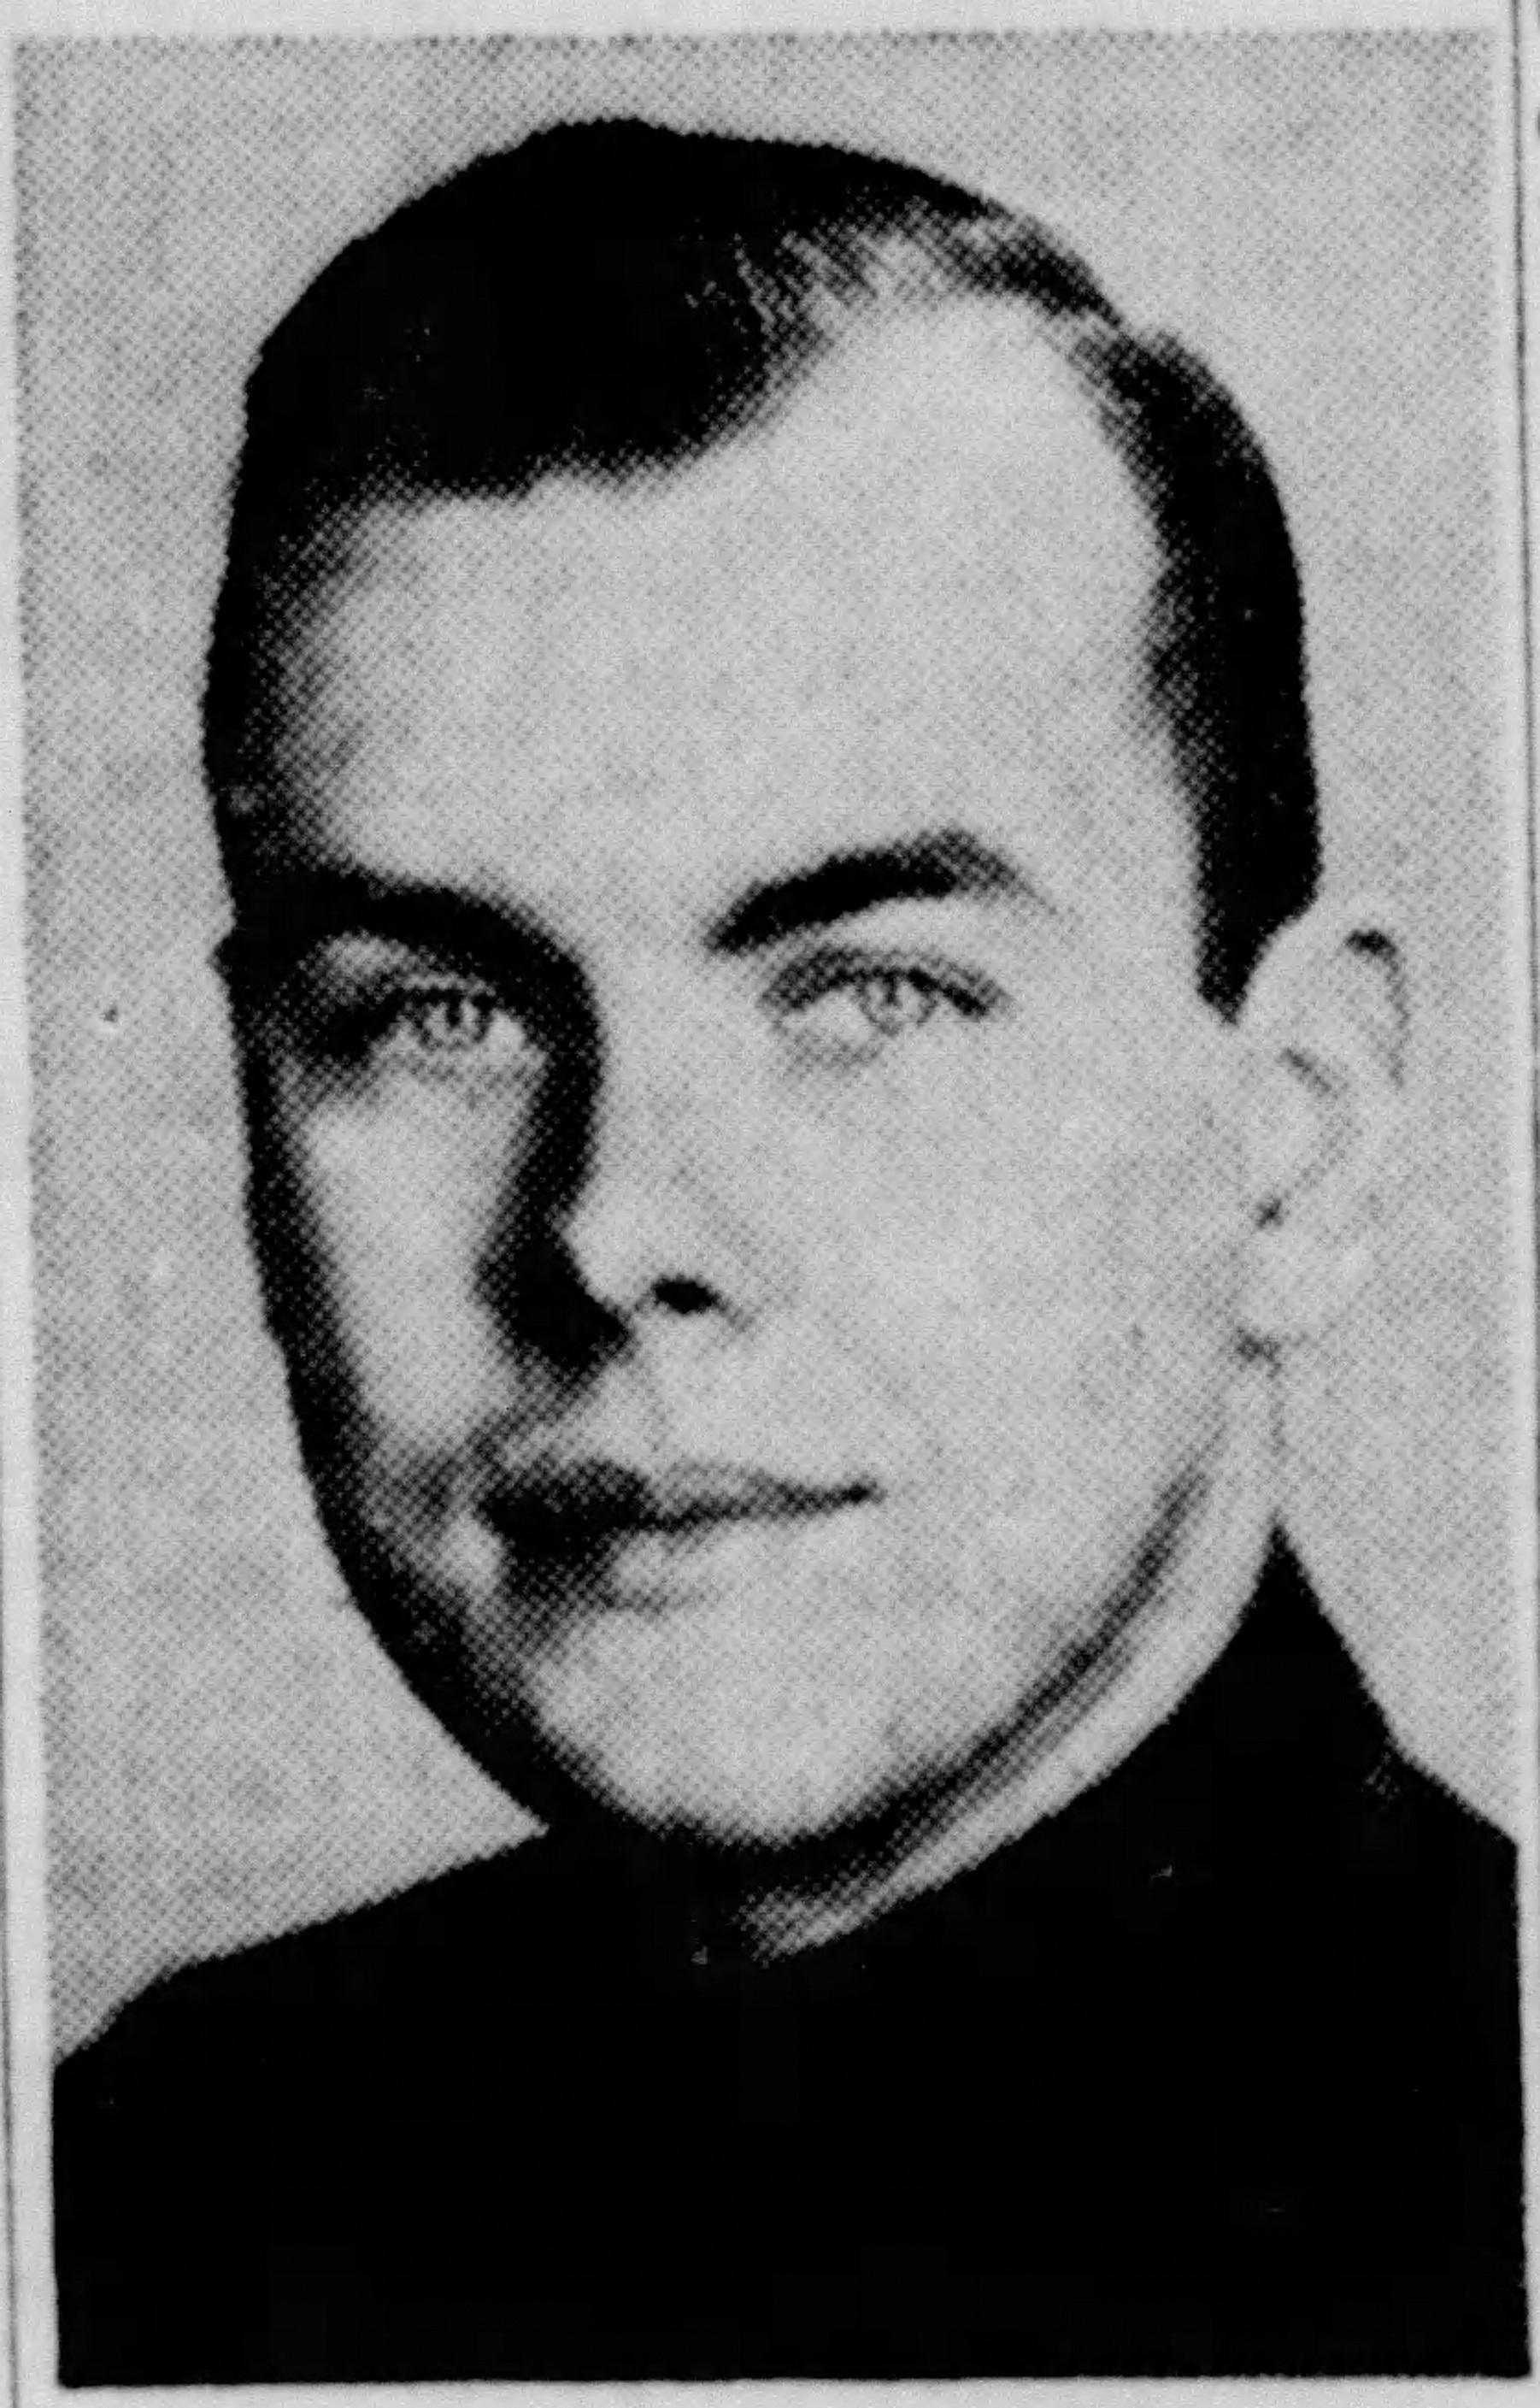 The La Crosse Tribune -February 26, 1954